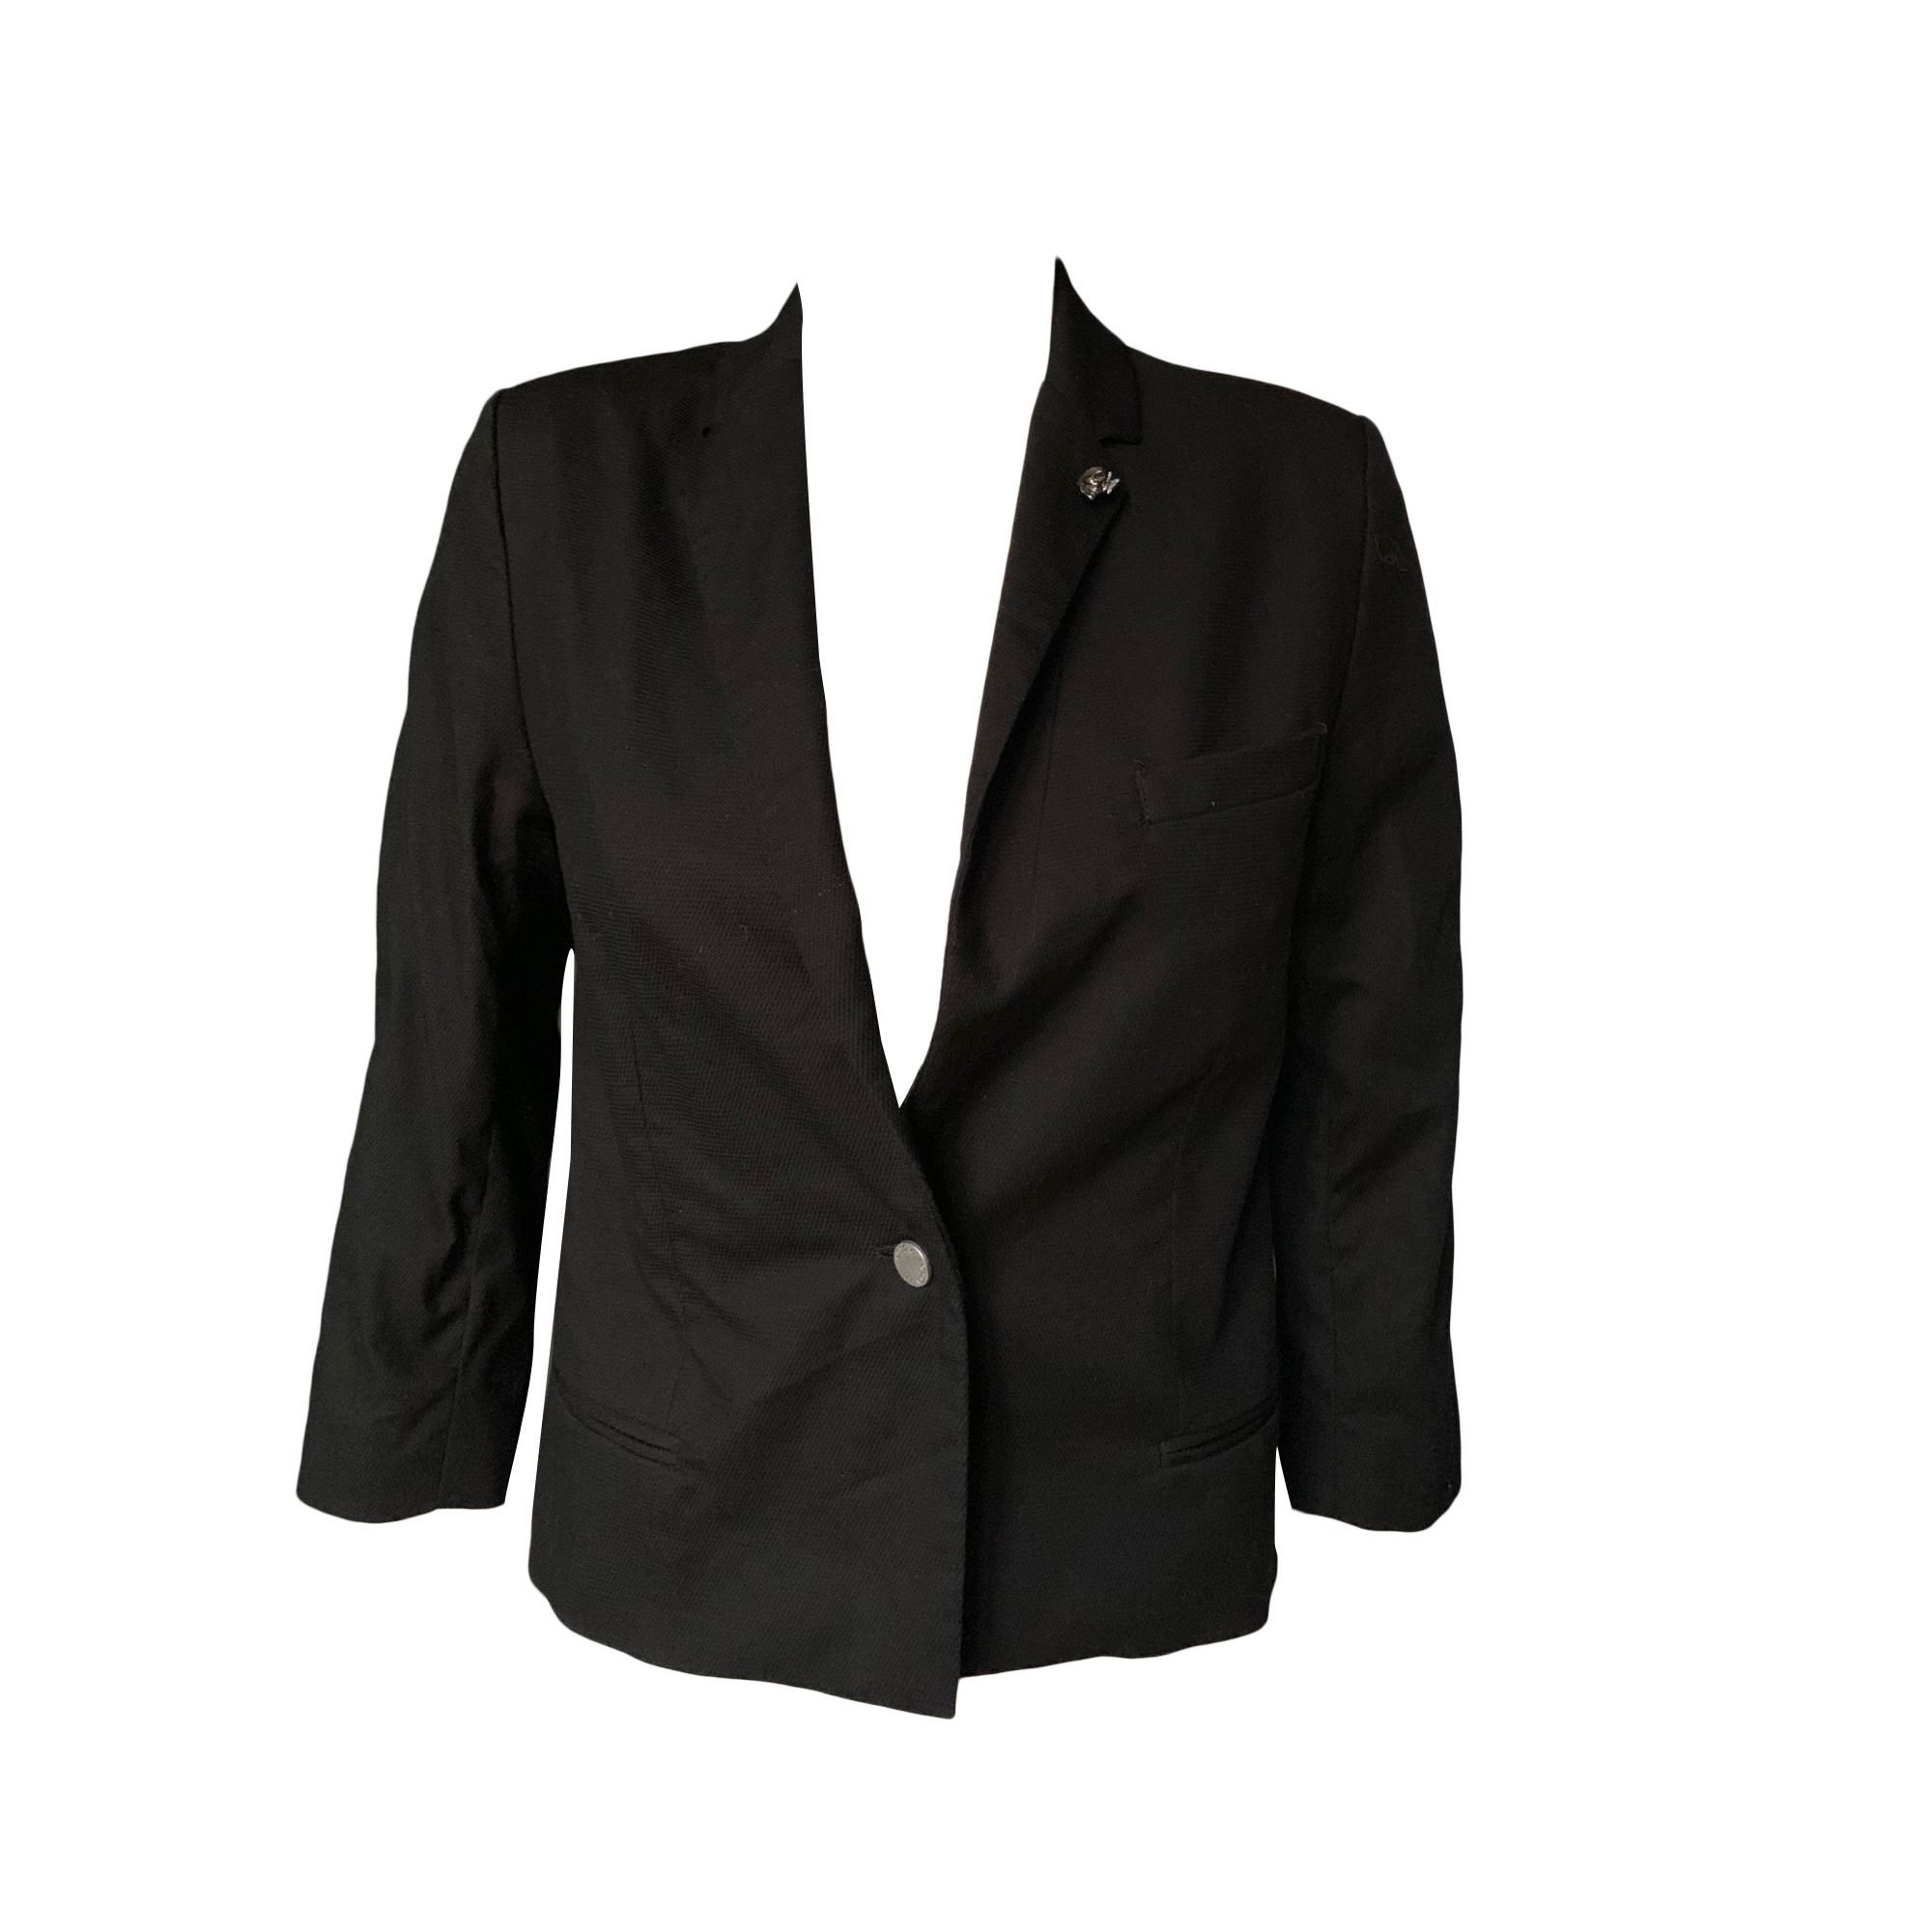 Blazer, veste tailleur ZADIG & VOLTAIRE Noir